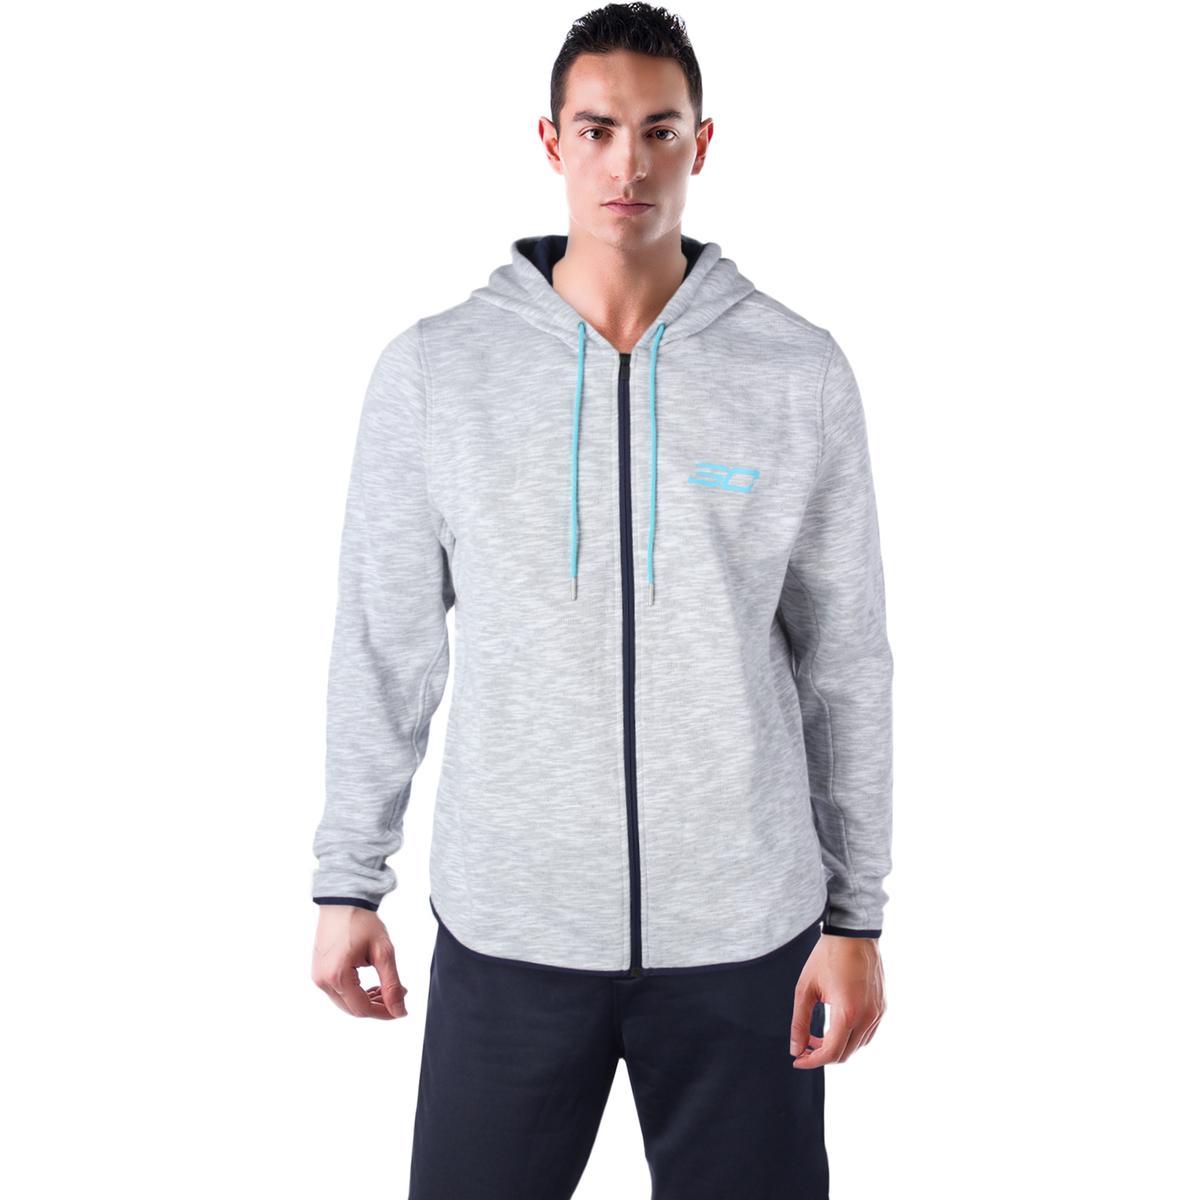 bdf7d640d Details about Under Armour Steph Curry SC 30 Men s Zip Up Hooded Sweatshirt